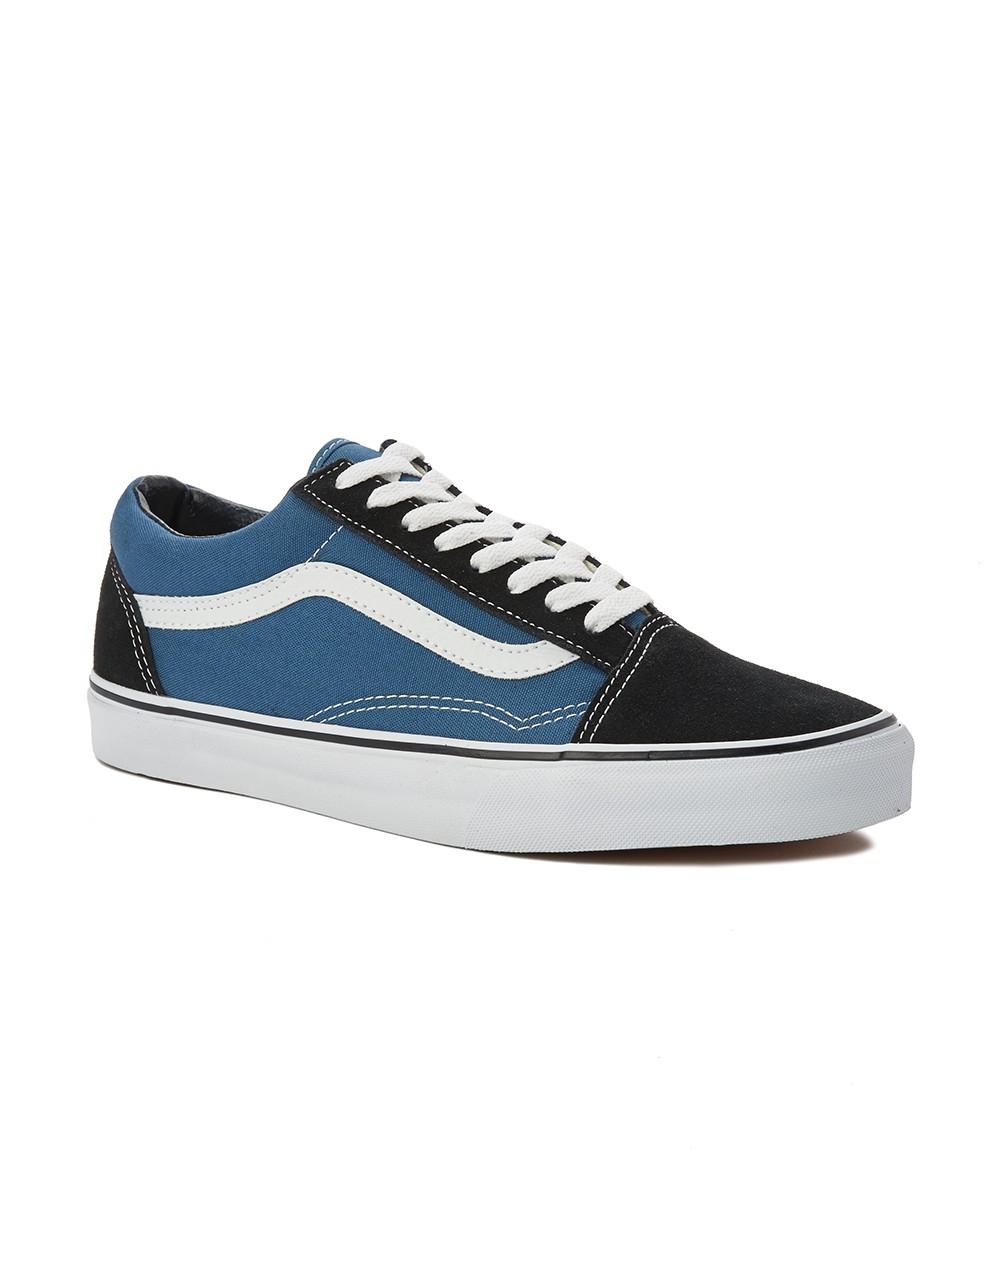 lyst vans old skool round toe canvas sneakers in blue for men. Black Bedroom Furniture Sets. Home Design Ideas